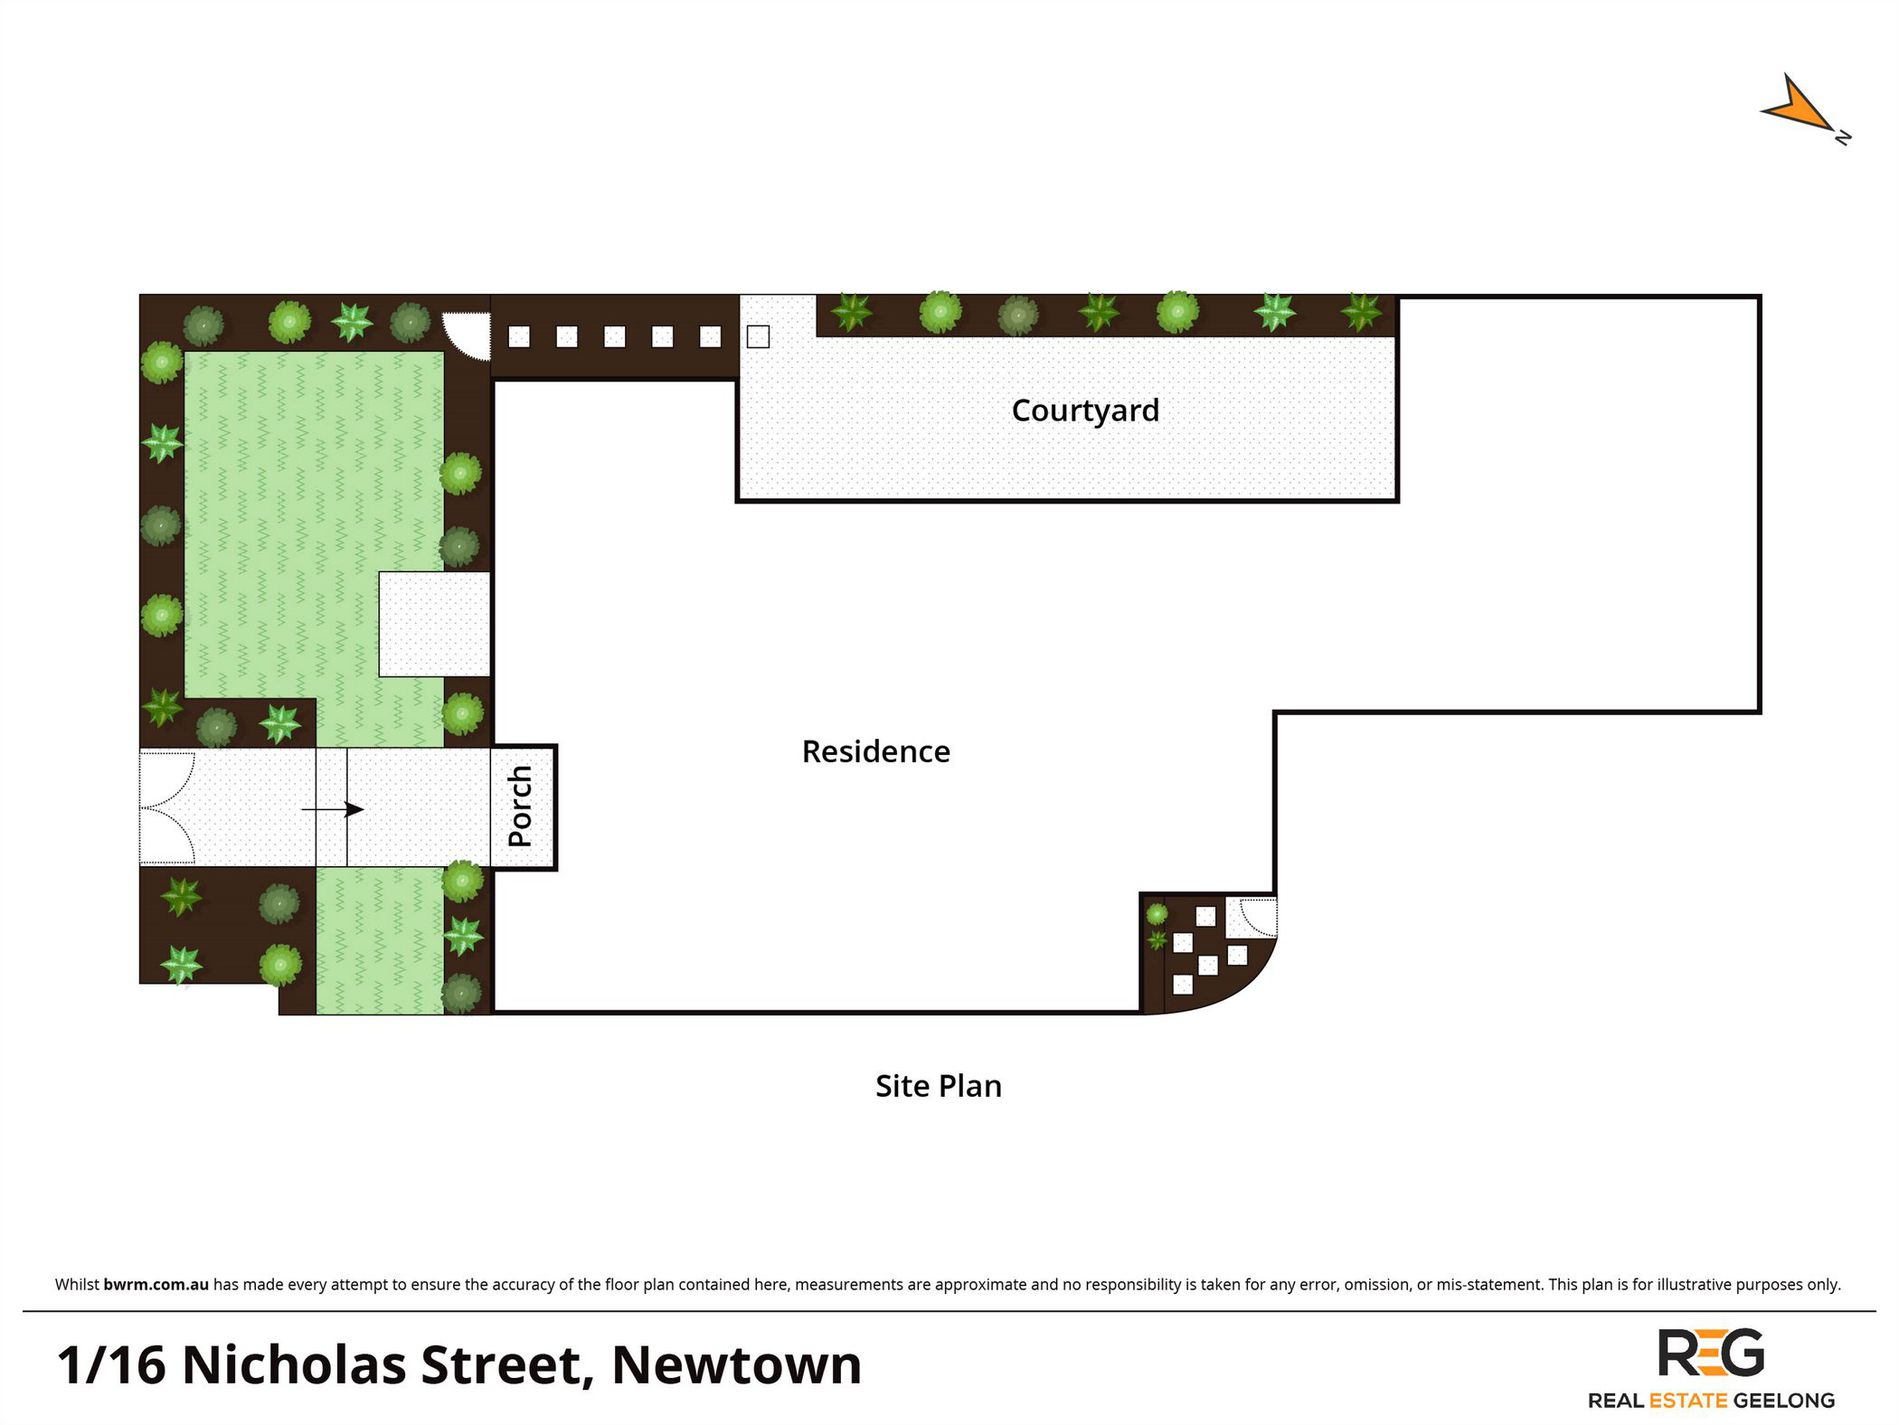 1 / 16 NICHOLAS STREET, Newtown